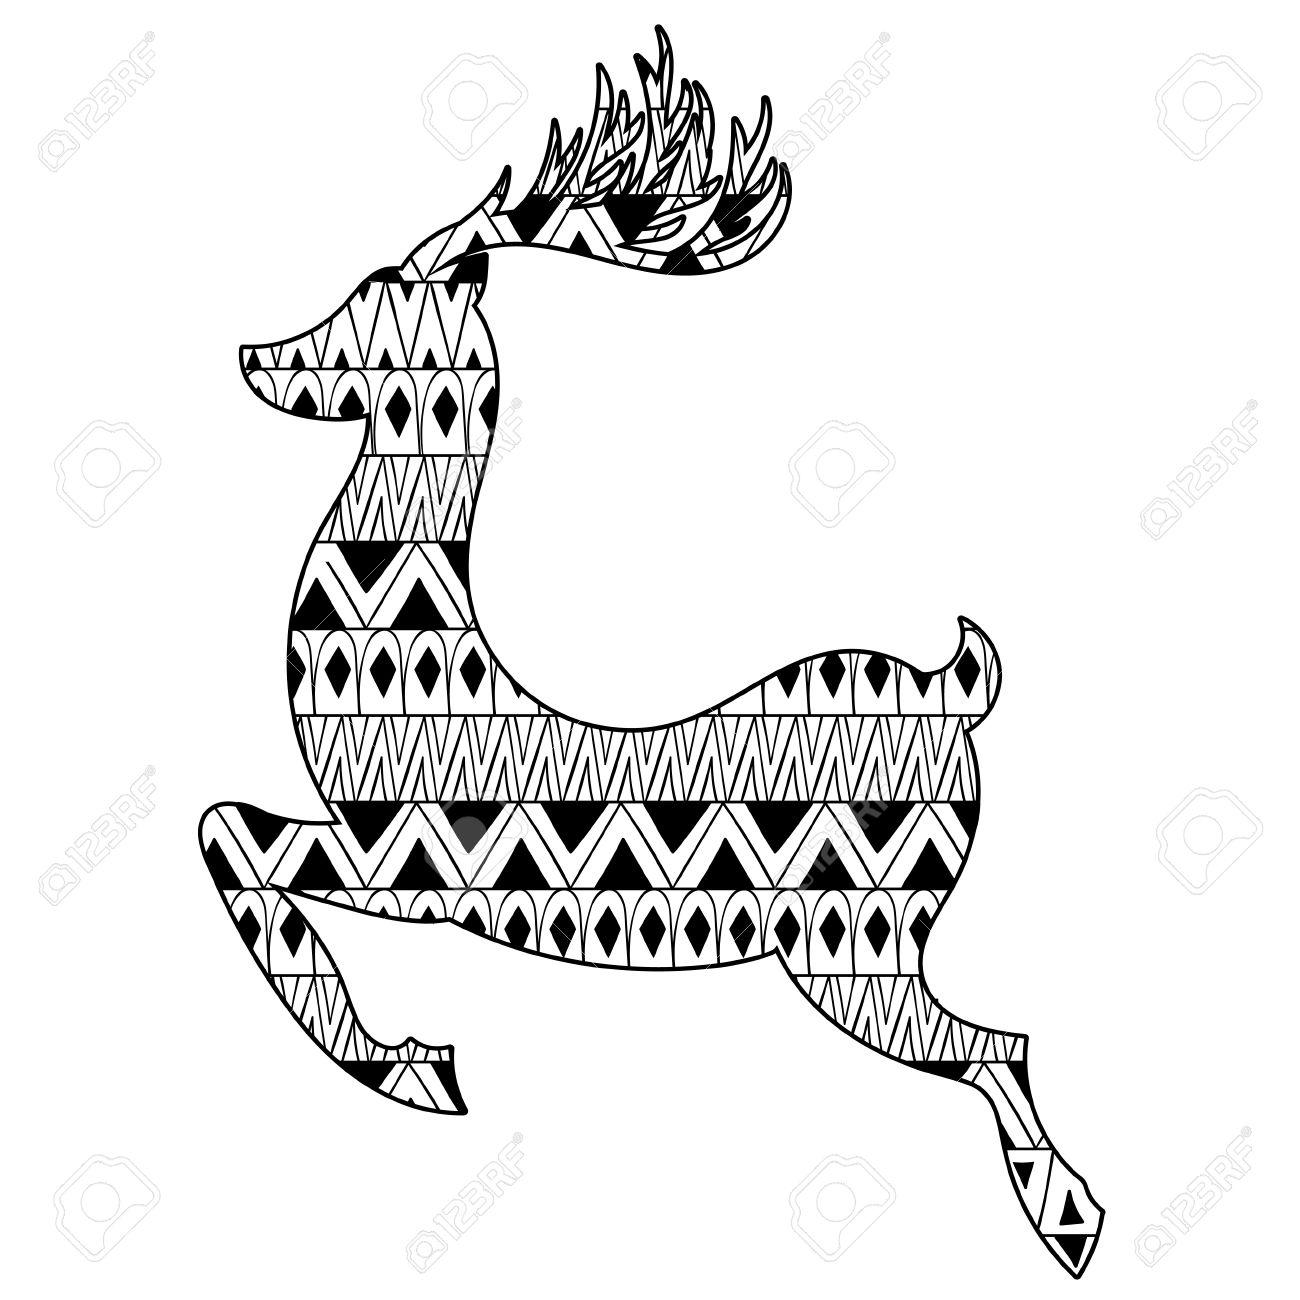 Reno De La Navidad étnica Tribal. Diseño Del Tatuaje De Boho Con ...